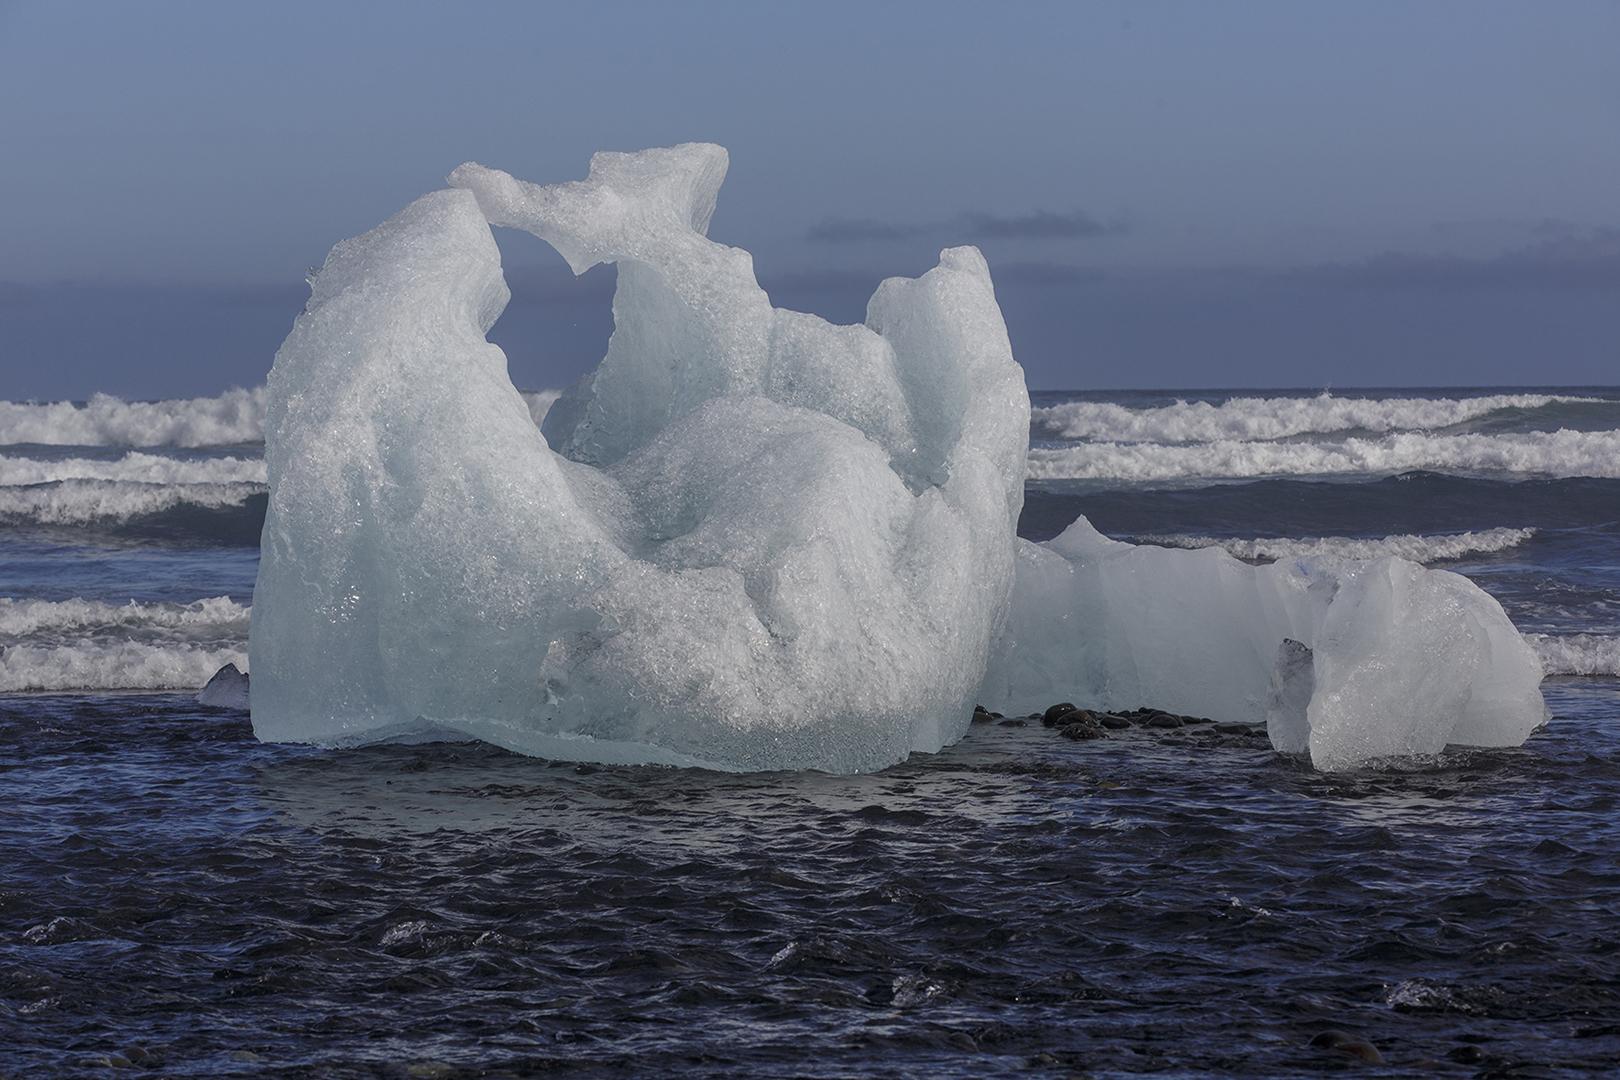 7032 Gletsjerzee 2016-08-24 Bw-v 1620